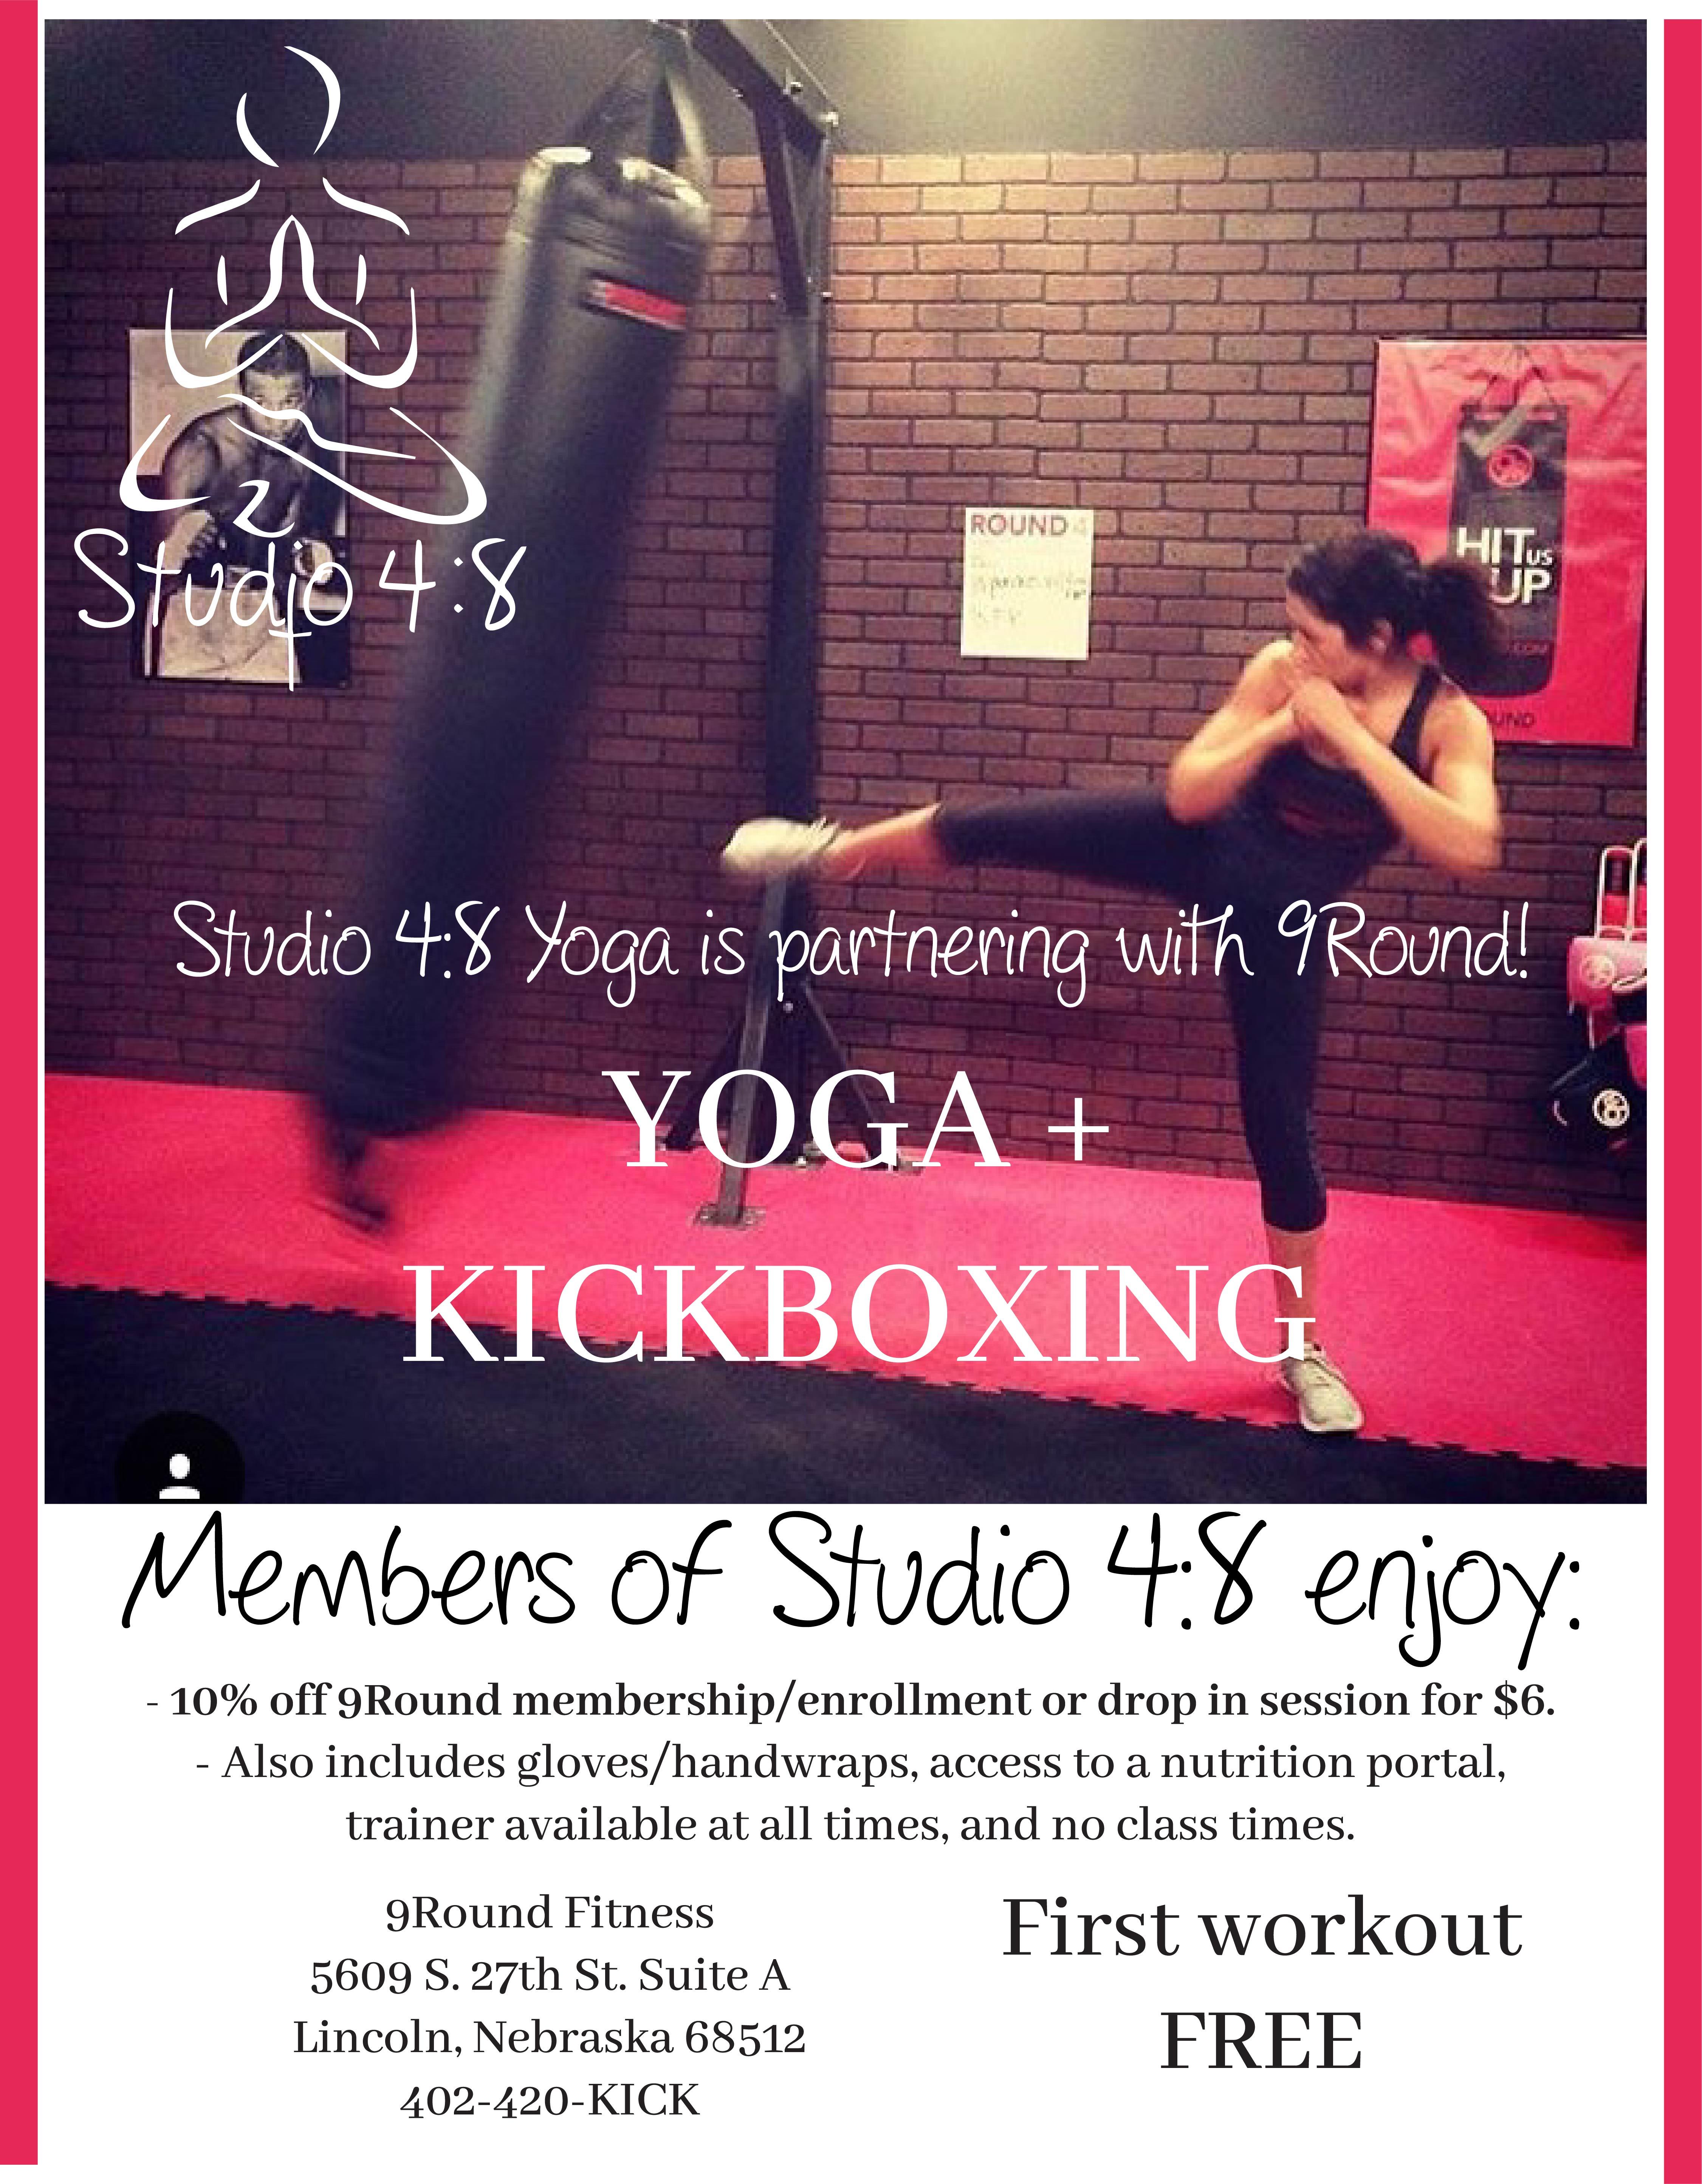 Partnership with 9Round || Kickboxing!